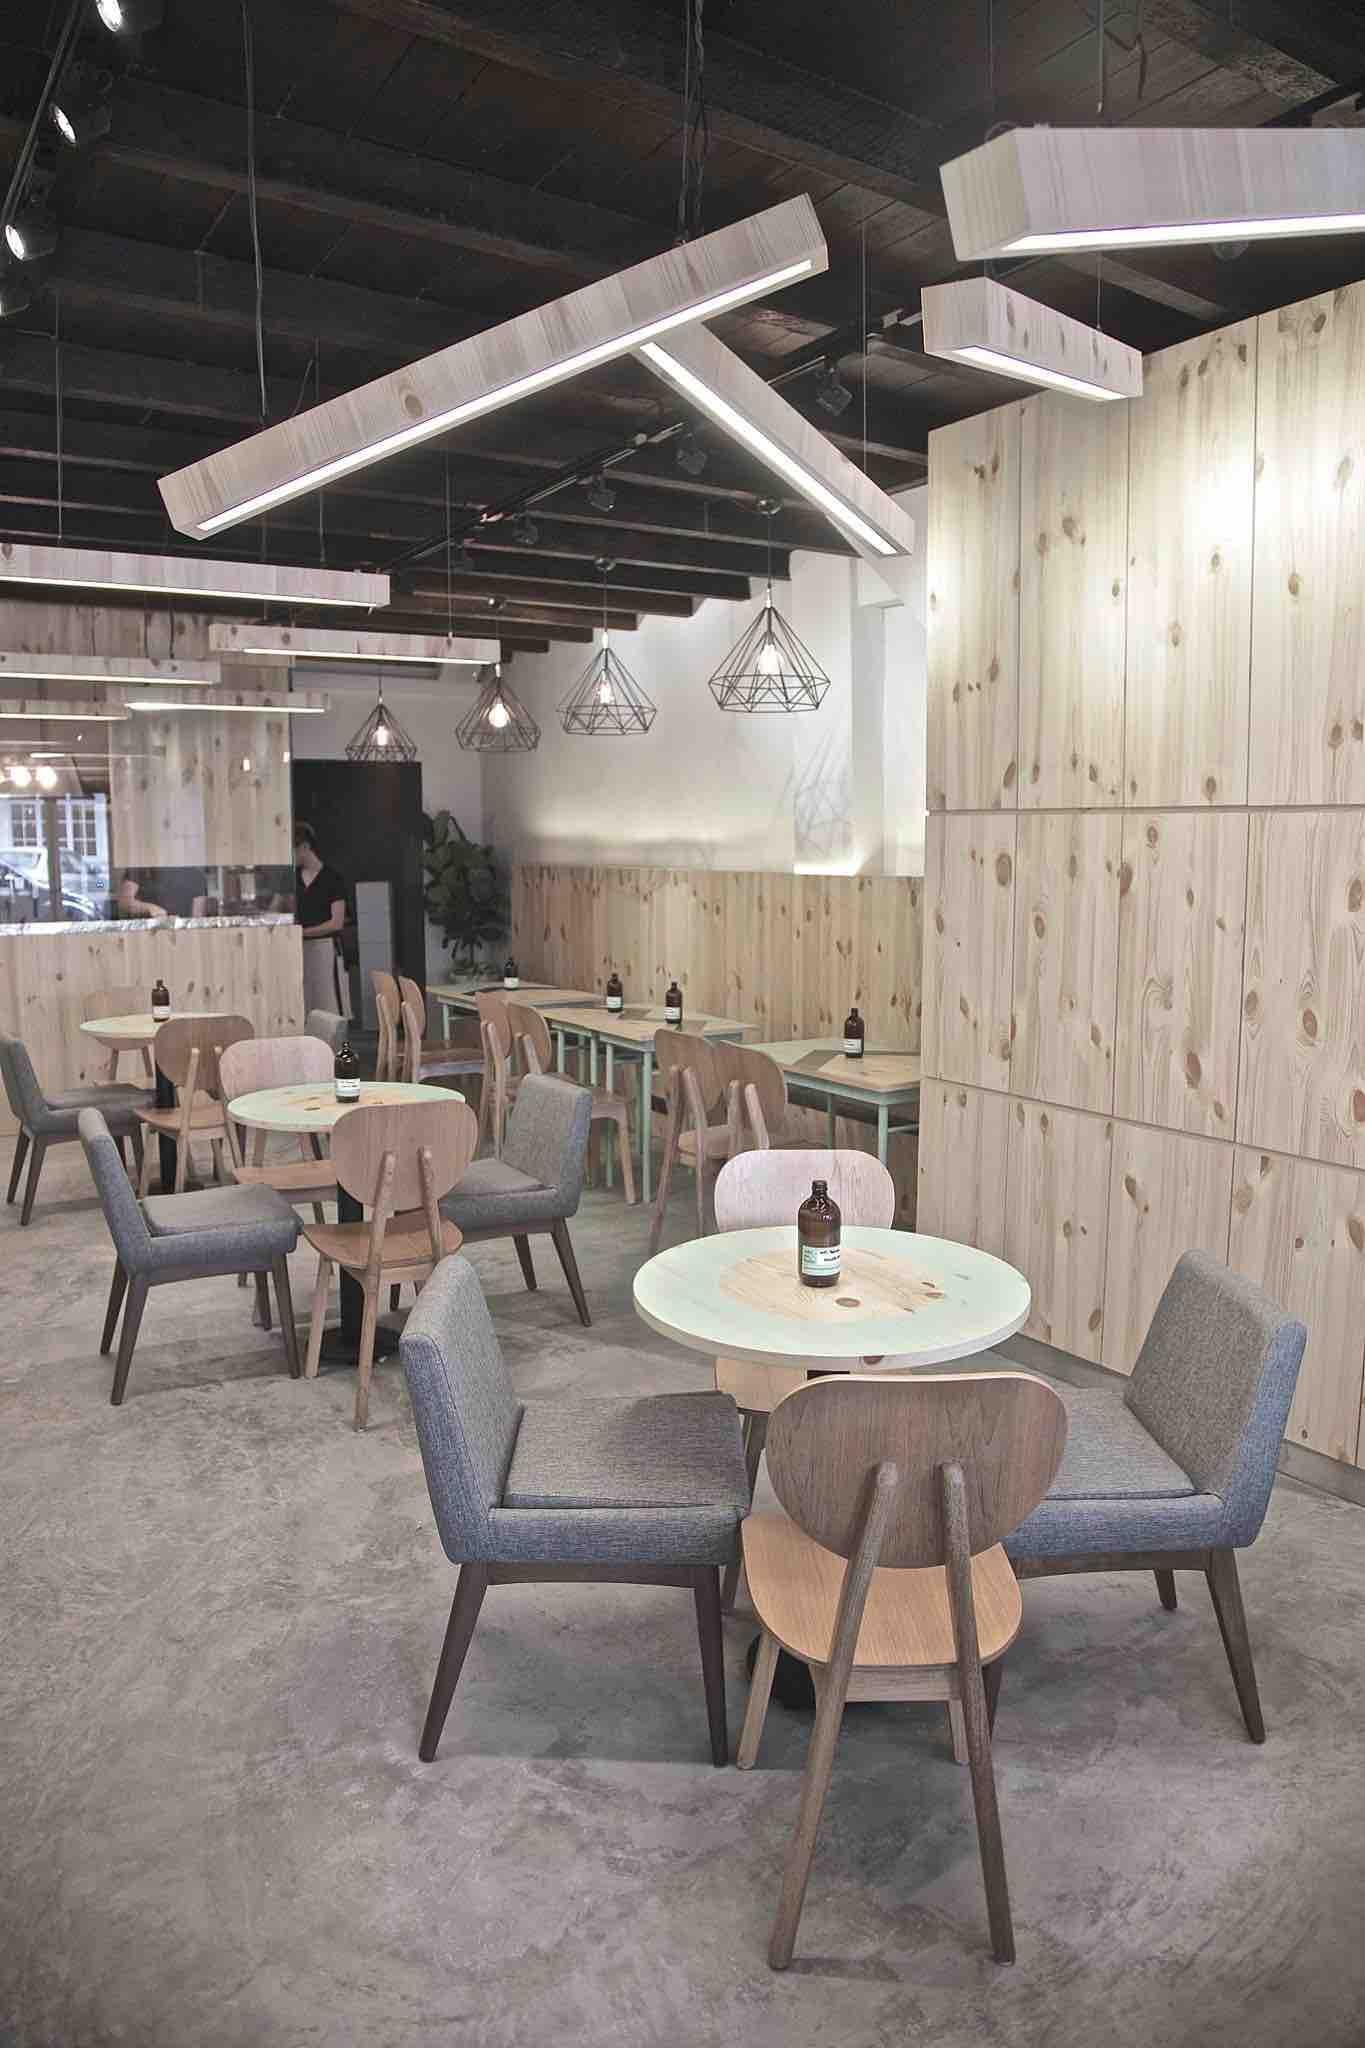 Pace Cafe Johor Bahru Malaysia - AspirantSG